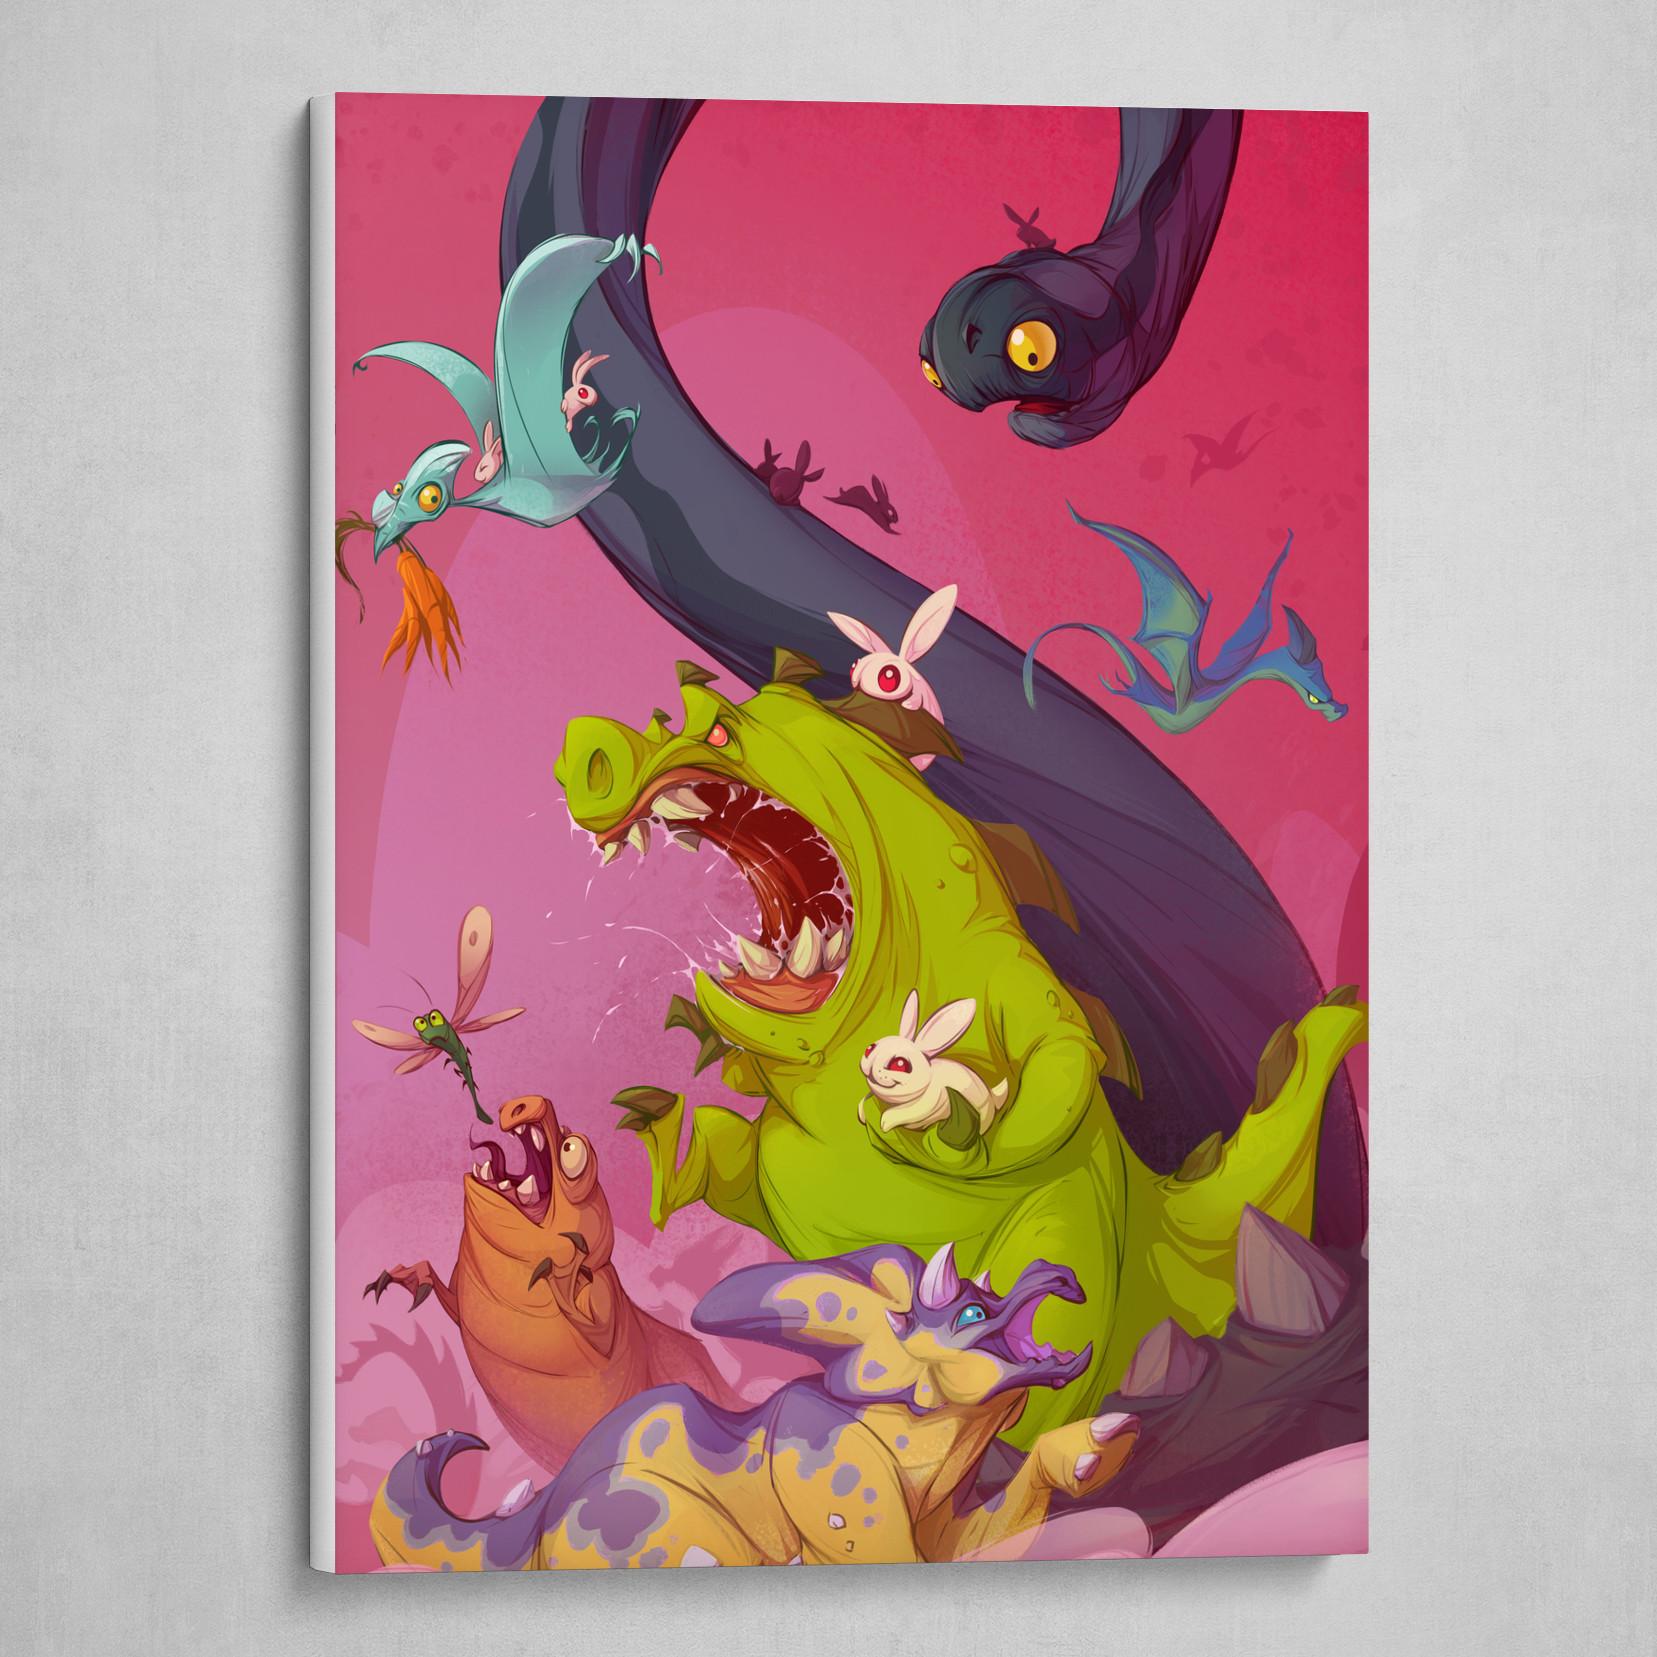 DinoWabbits